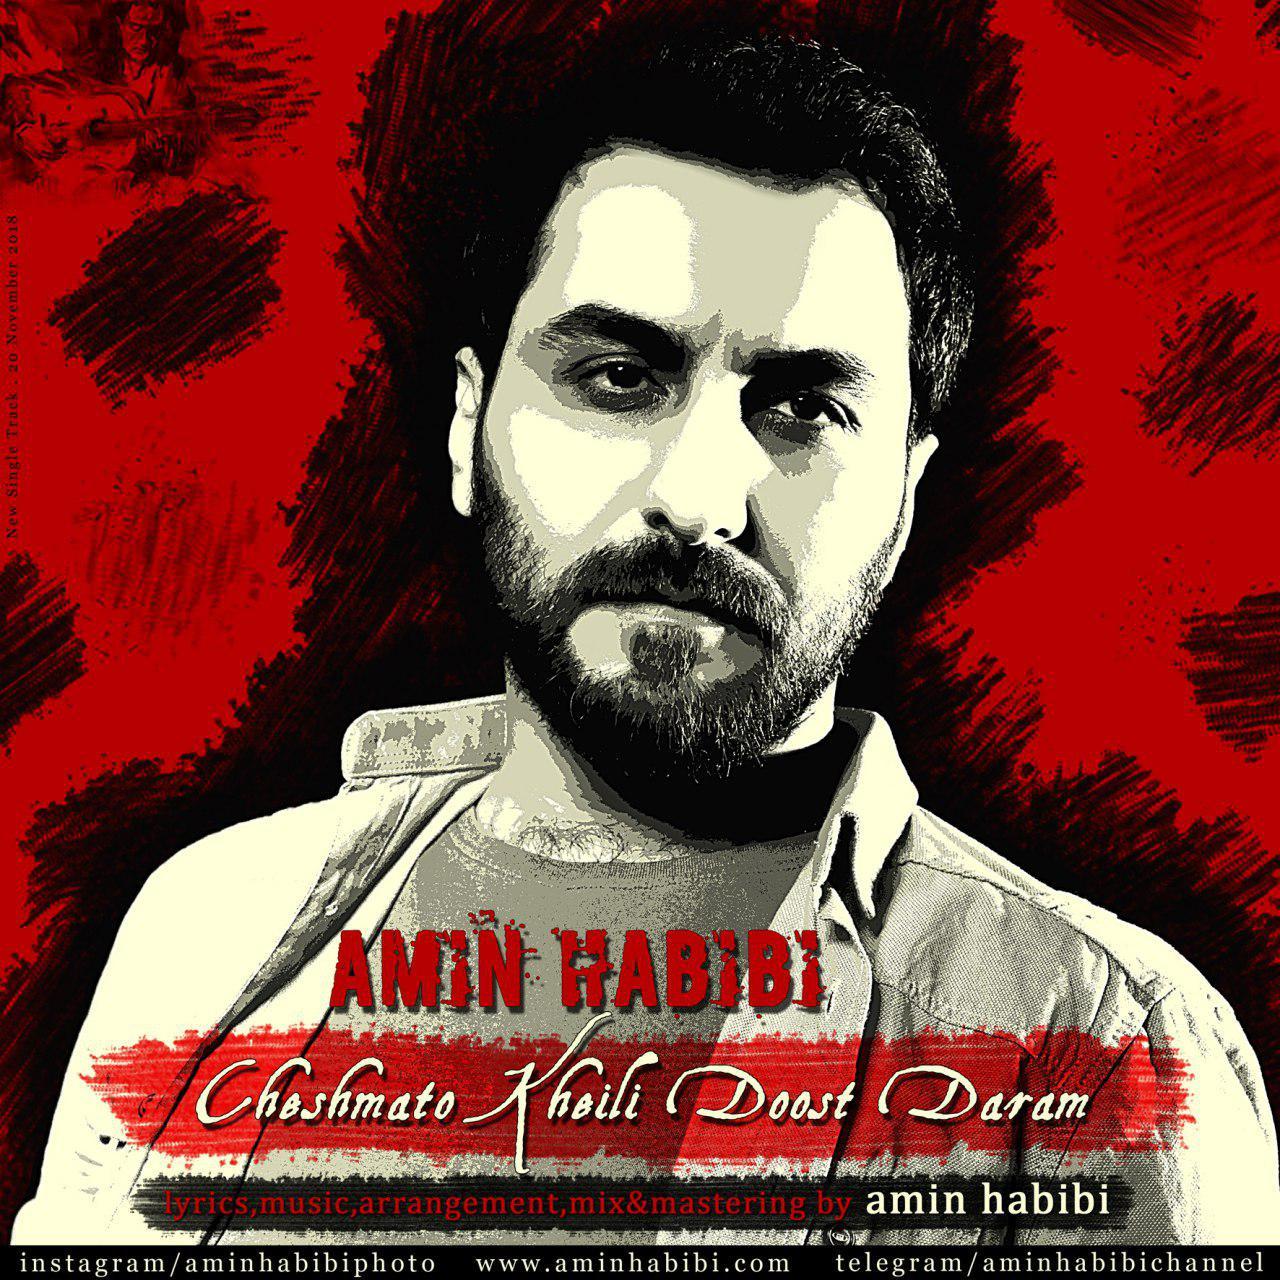 Amin Habibi - Cheshmato Kheili Doos Daram